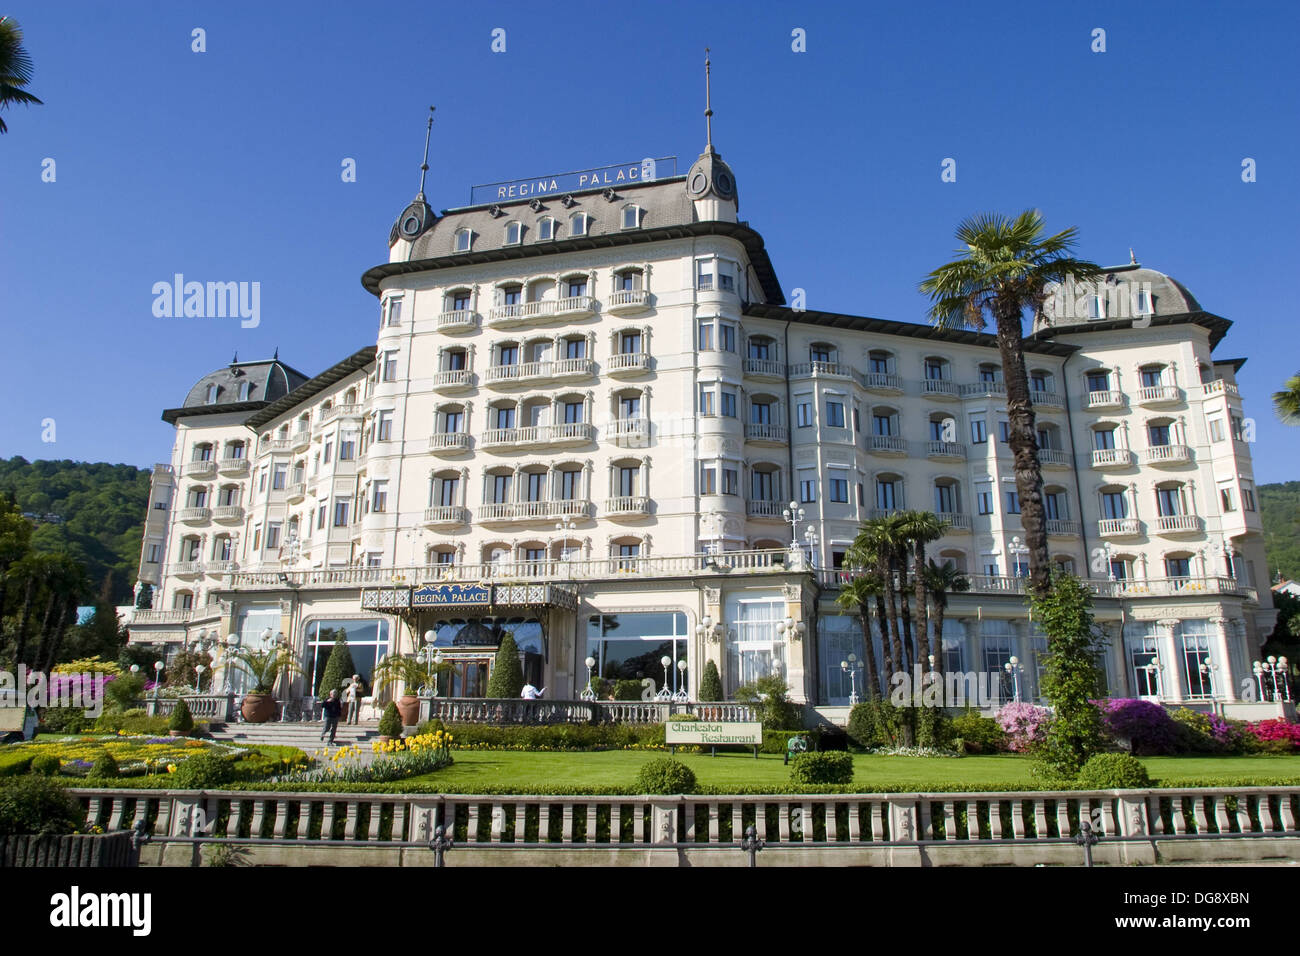 Regina Palace Hotel Stresa Lake Maggiore Italy Stock Photo Alamy